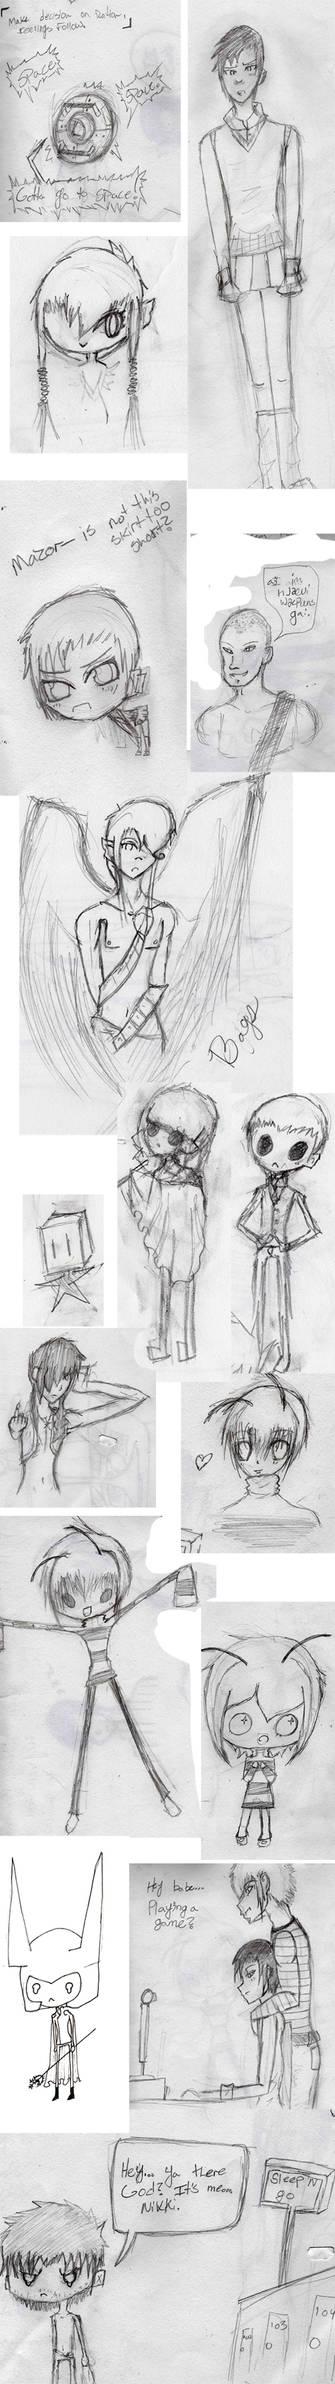 DoodleDump